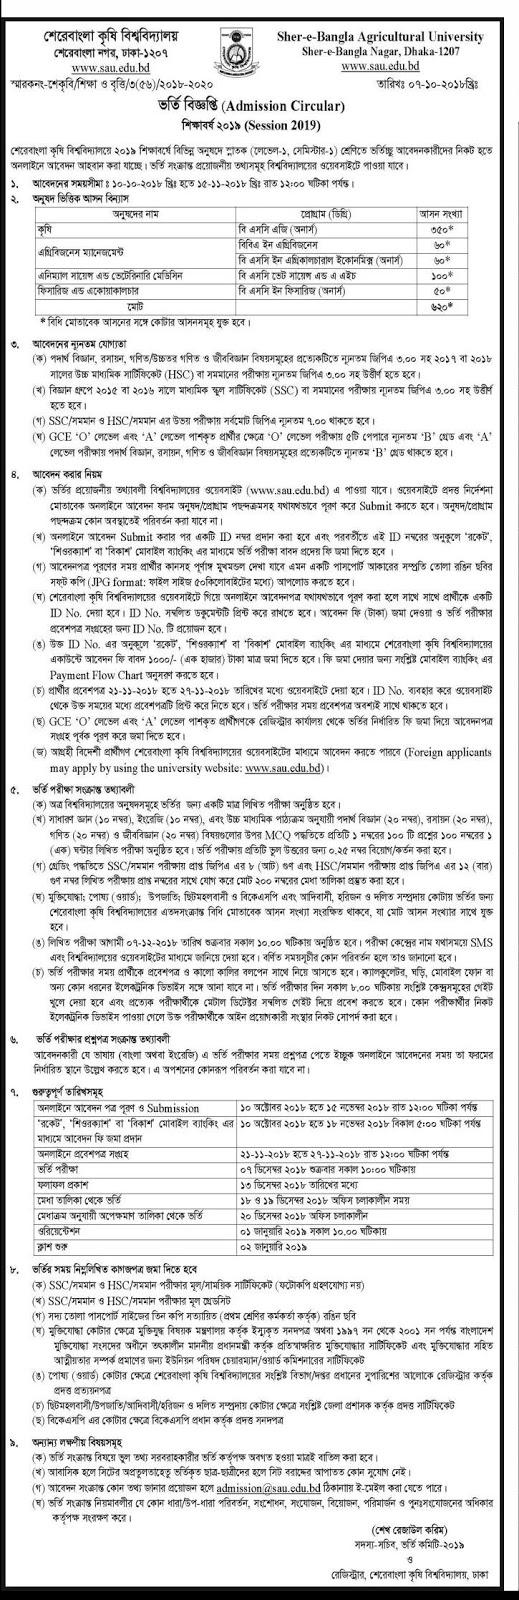 Sher-e-Bangla Agricultural University (SAU) Admission Circular 2018-2019